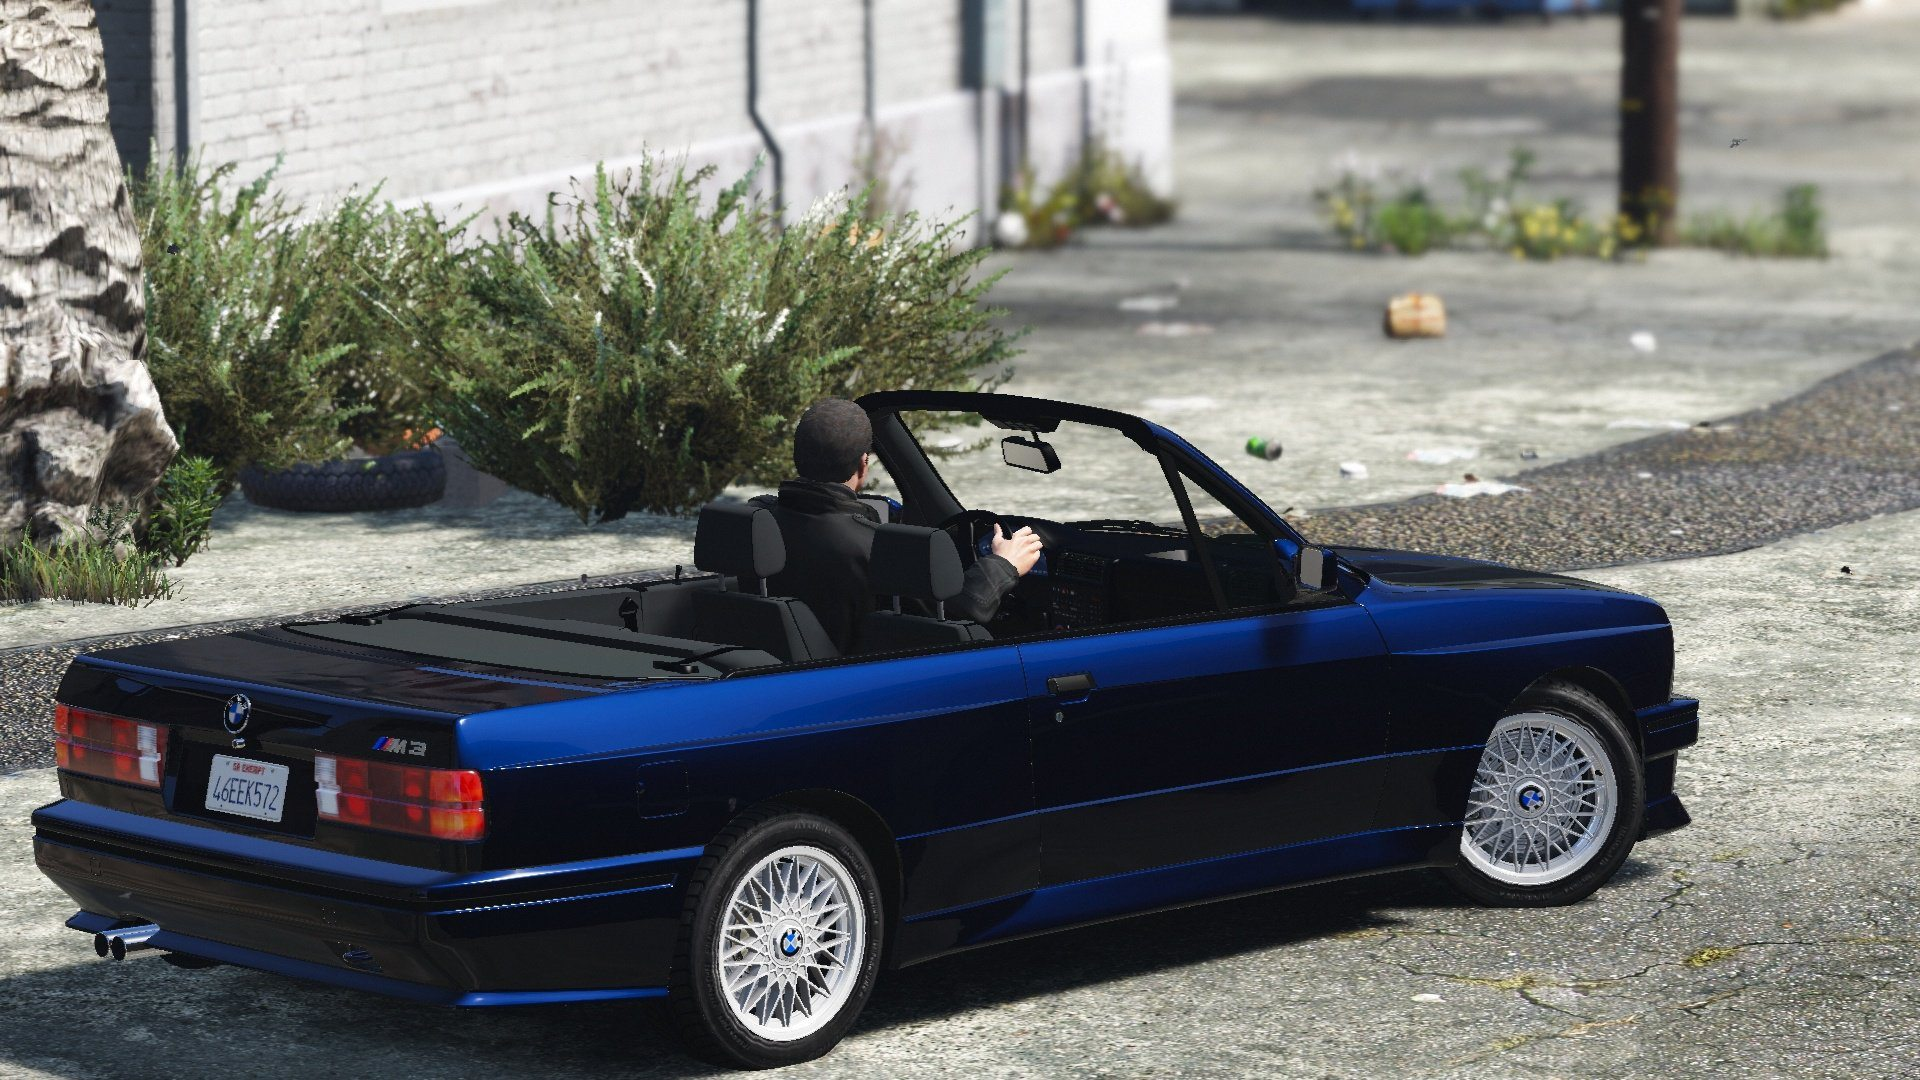 BMW M3 E30 1991 [Дополнение | Тюннинг] - g5mod.ru - GTA V